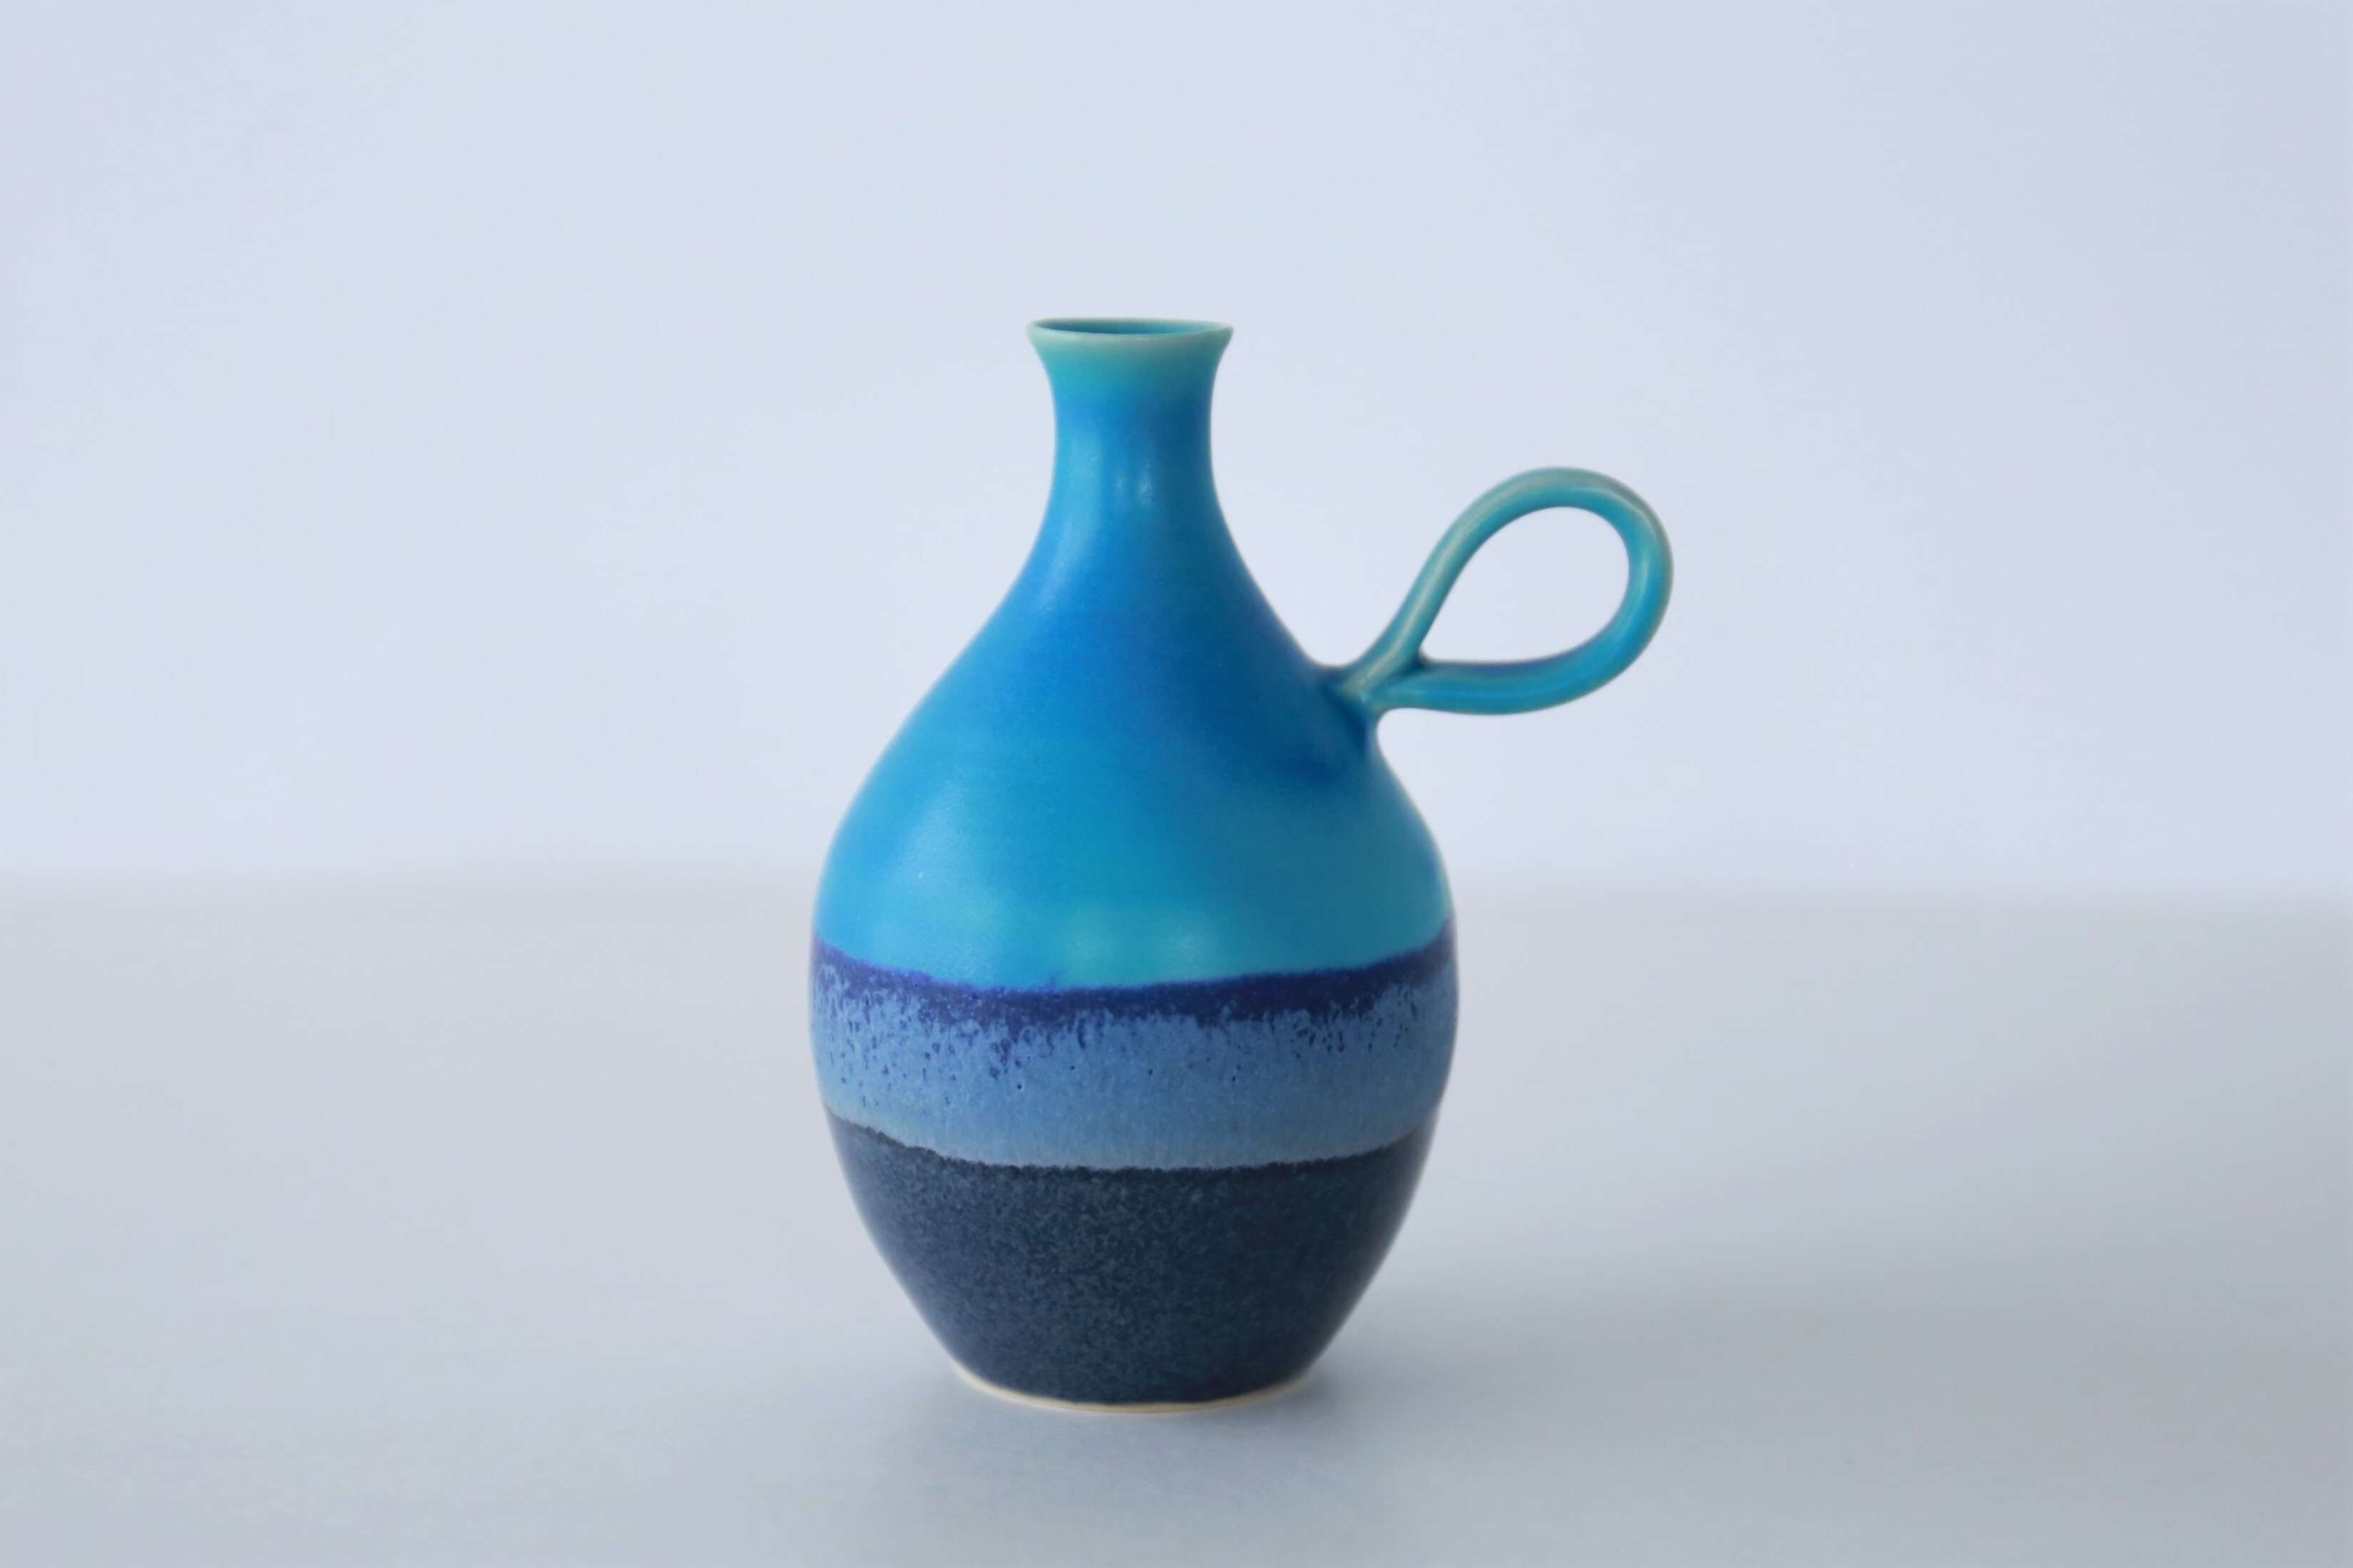 wakako ceramics /坂本和歌子 うみいろ いちりんざし(もち手つき)